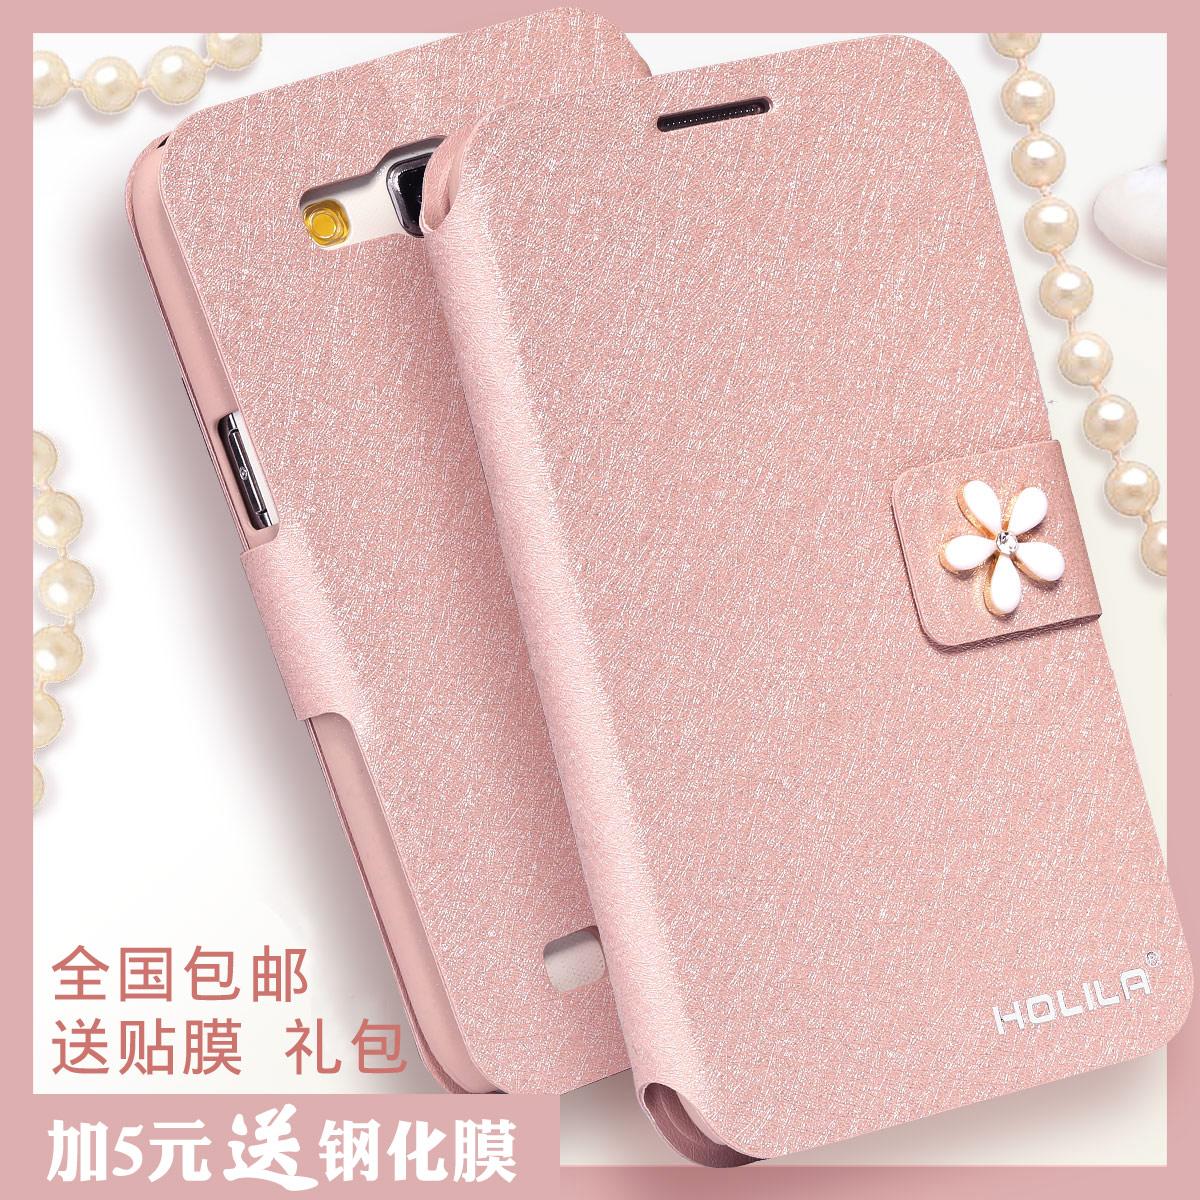 HOLILA三星i8552手机套 GT-i8558手机壳i869电信版皮套保护套外壳